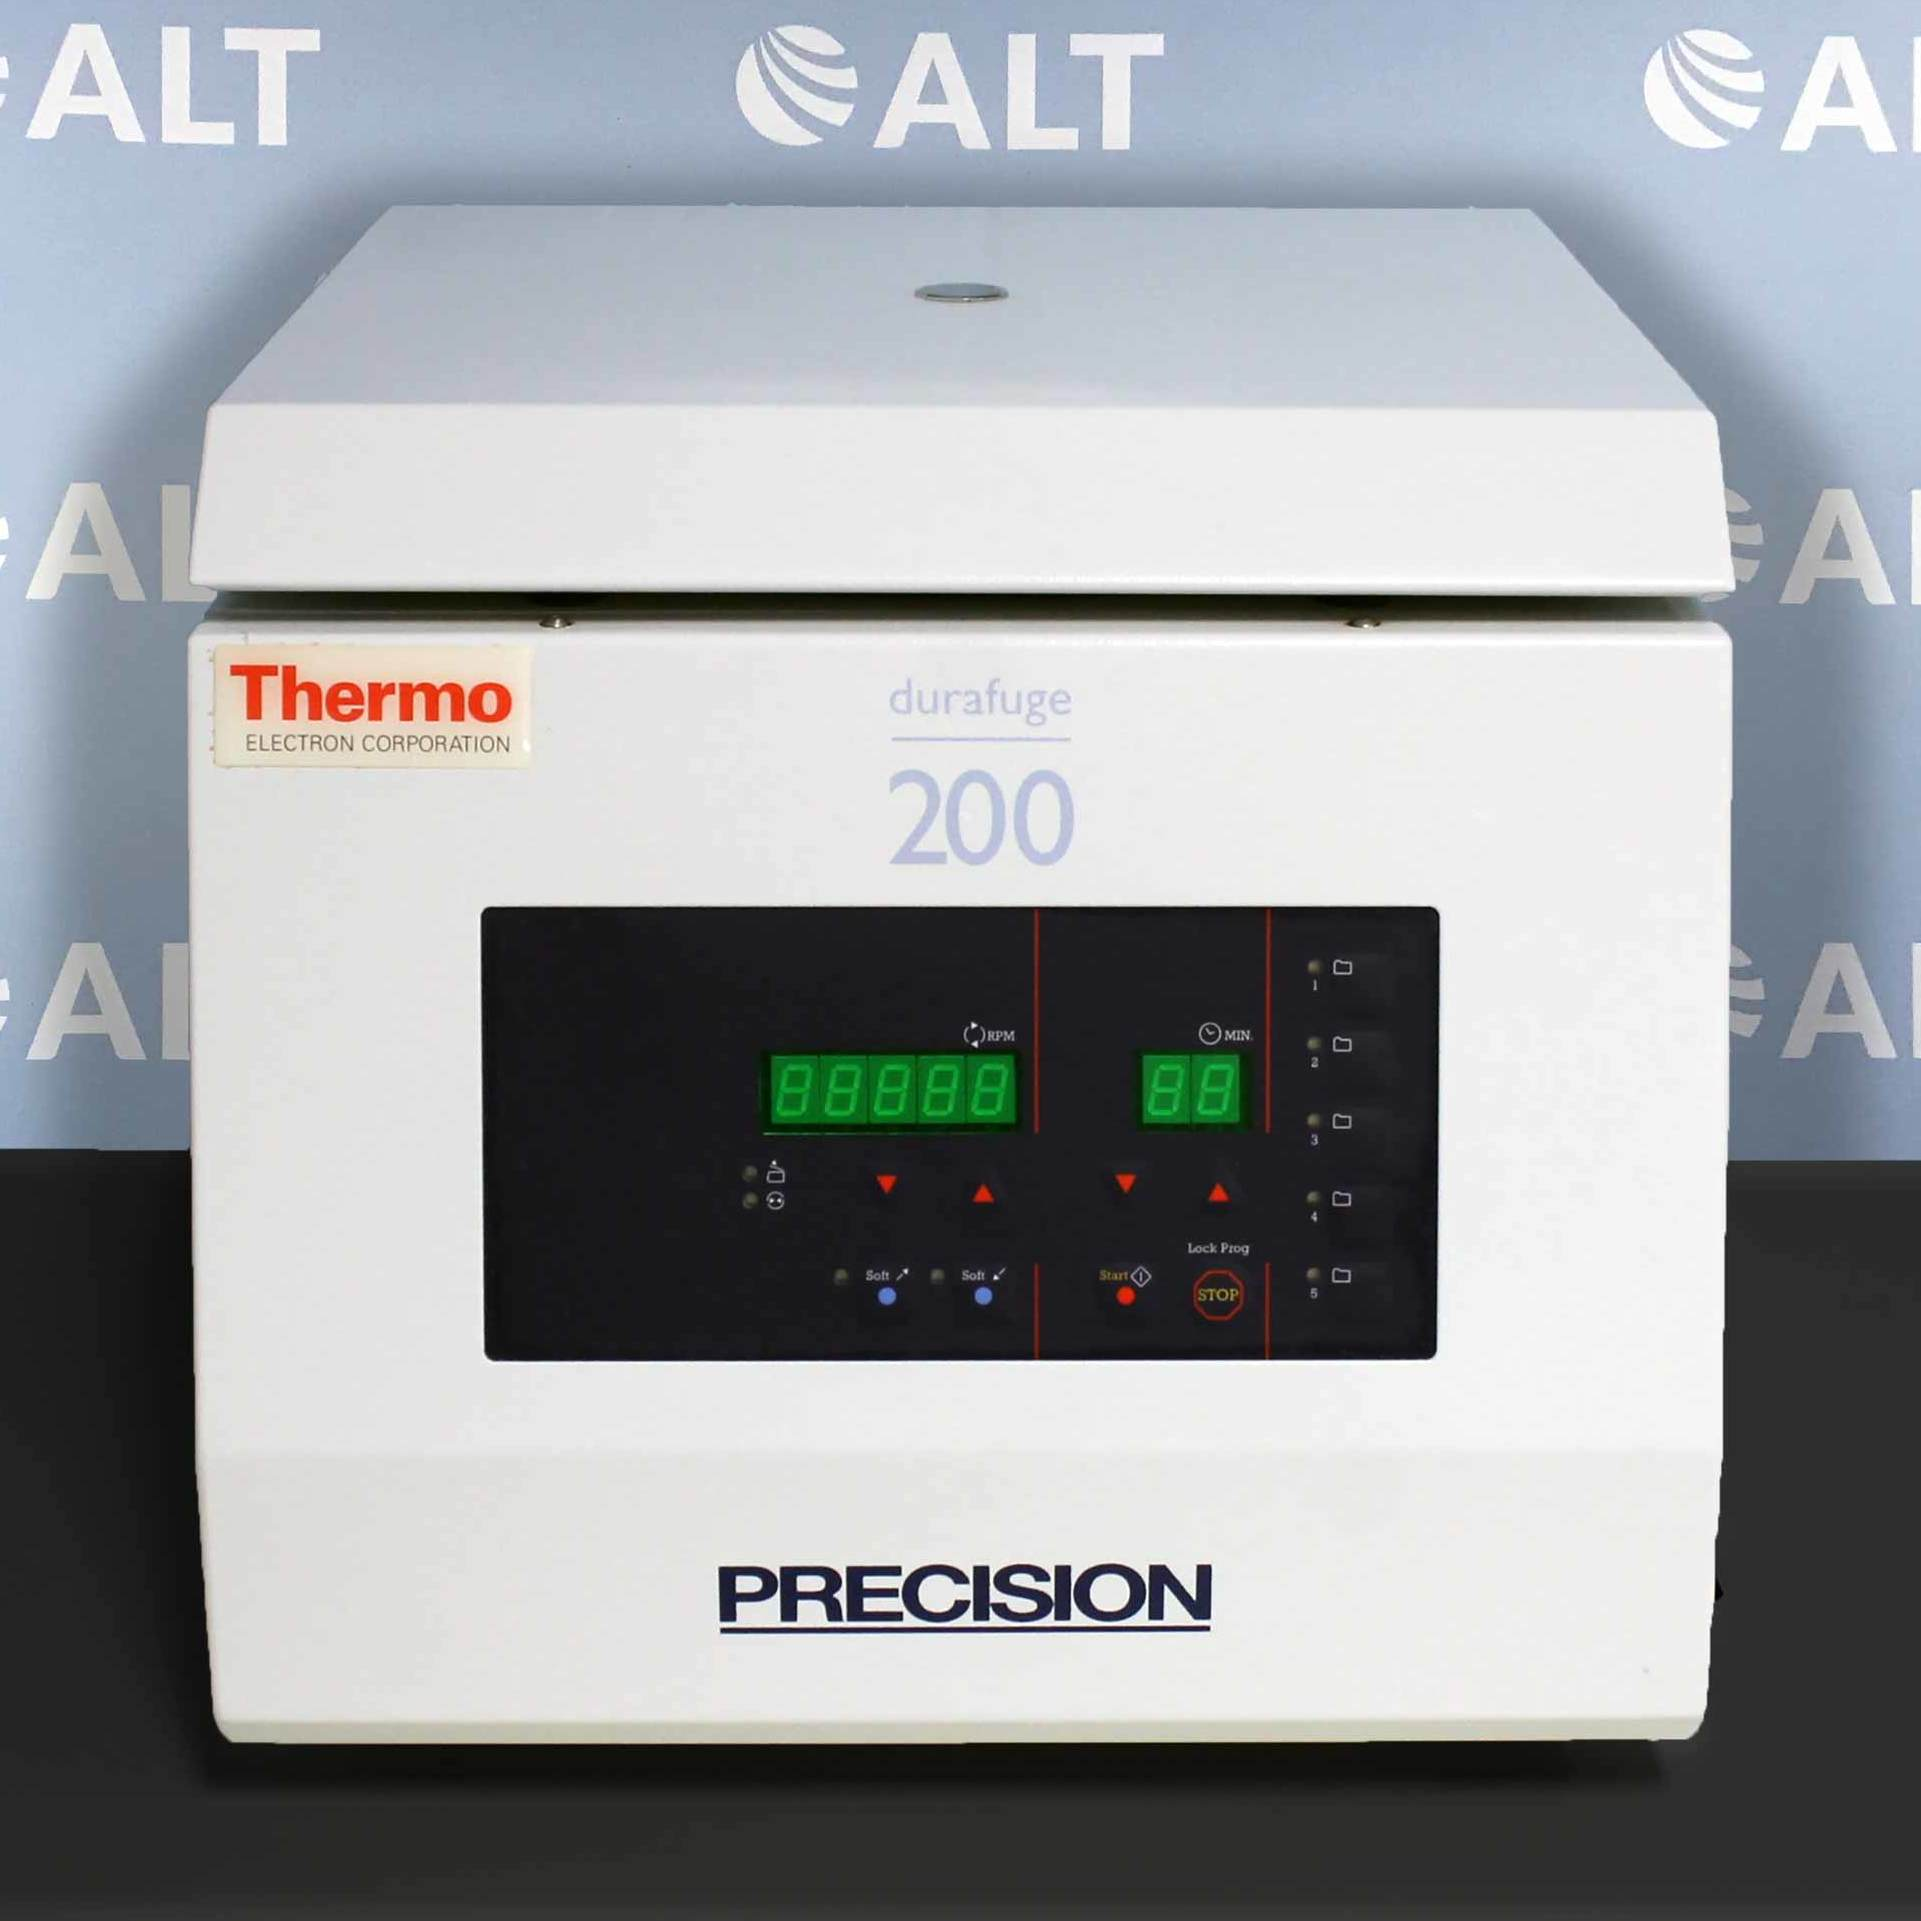 Thermo Durafuge 200 Precision Centrifuge Image